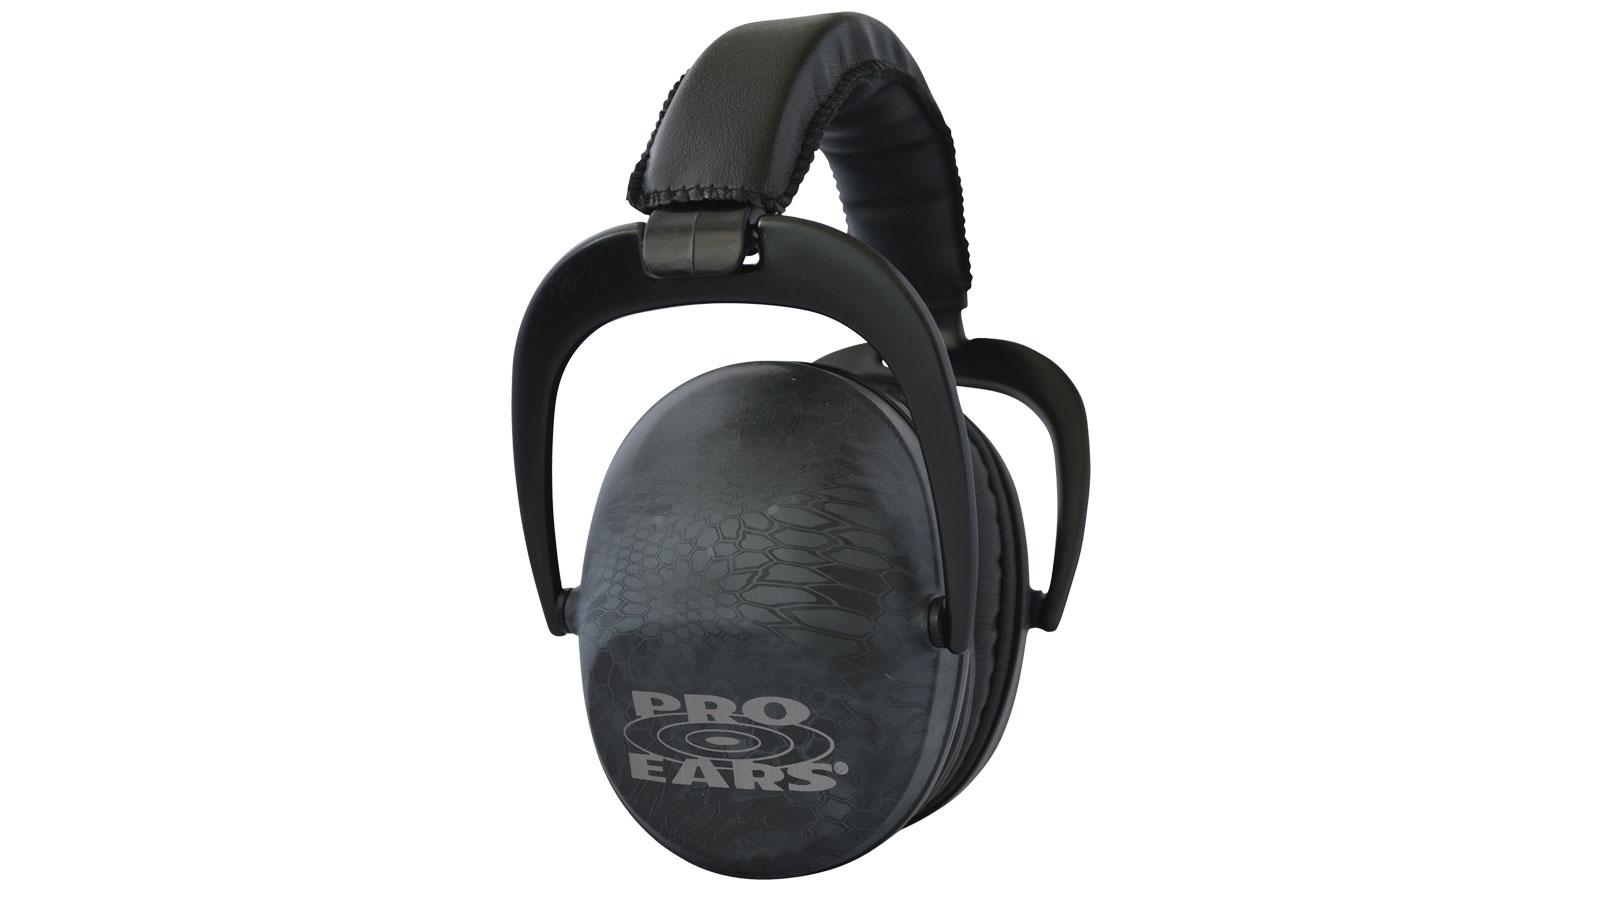 Pro Ears Ultra Sleek Noise Reduction Rating 26dB, Typhoon